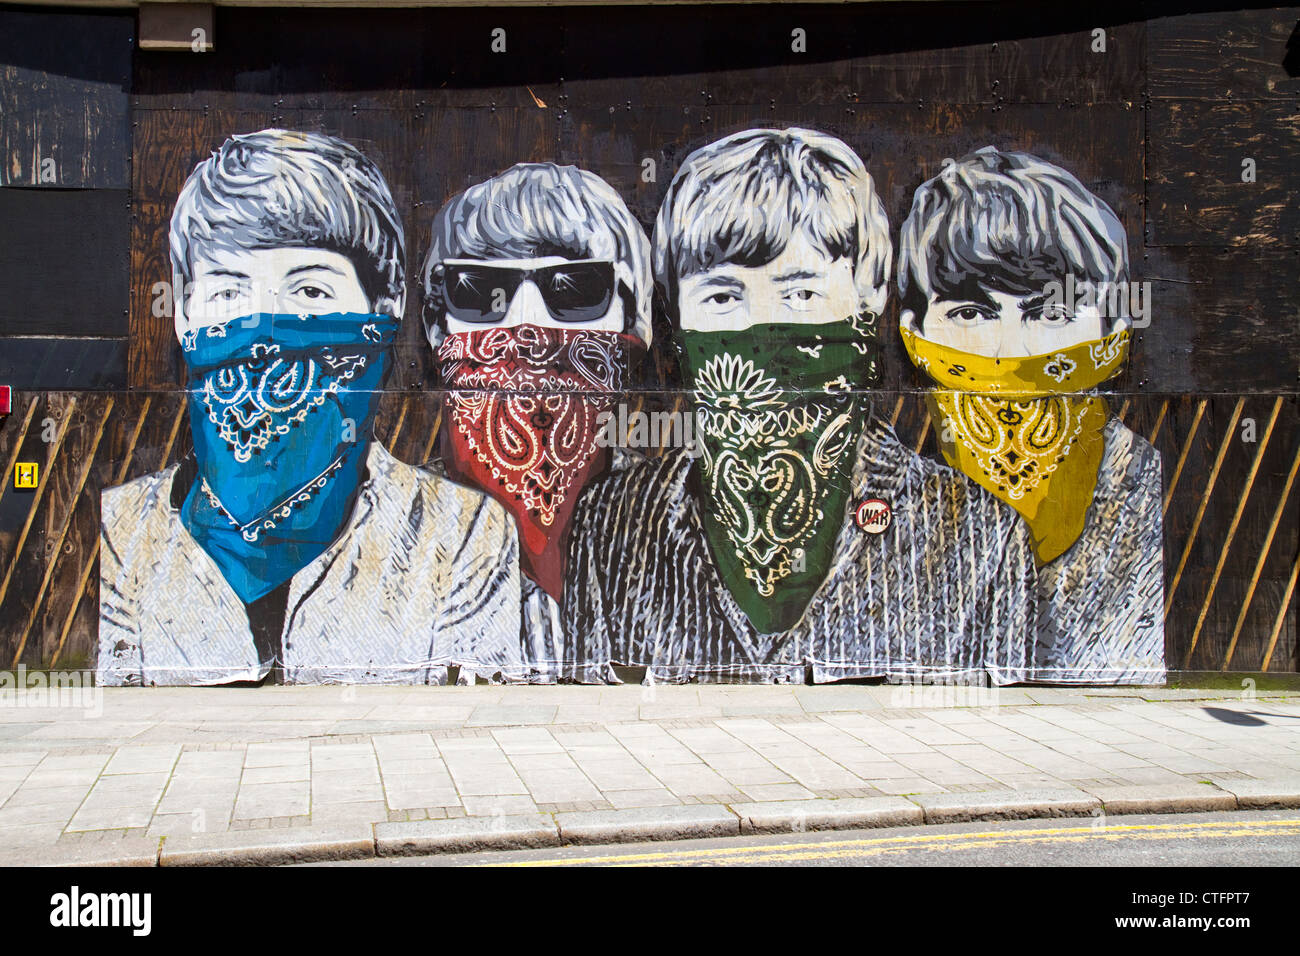 Paste-up by street artist Mr Brainwash in London depicting ...